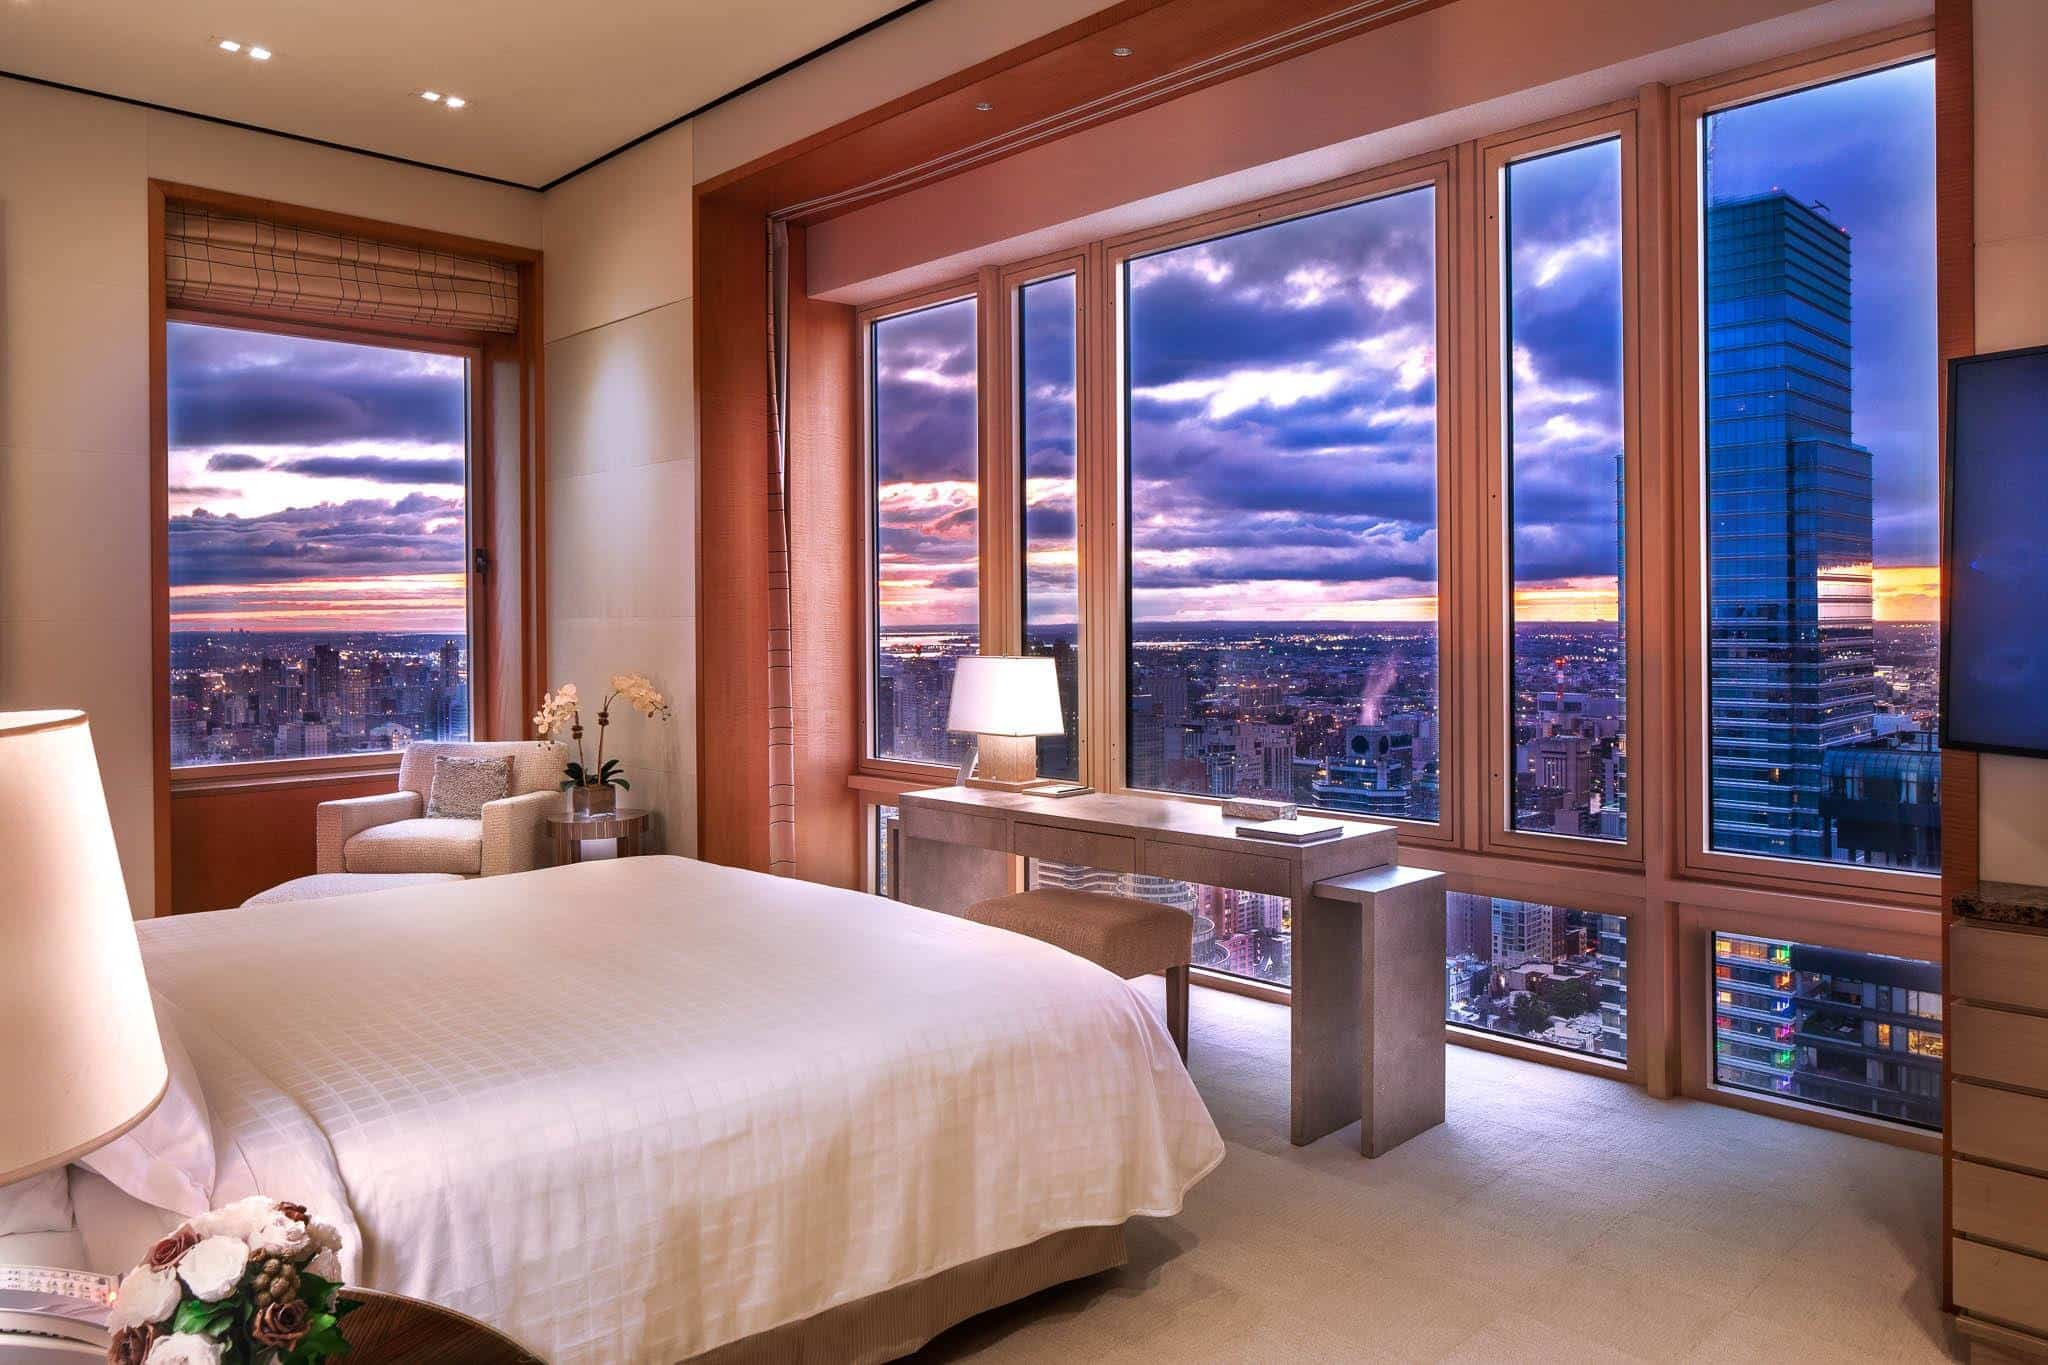 Four Seasons Hotel New York - hotels chers monde